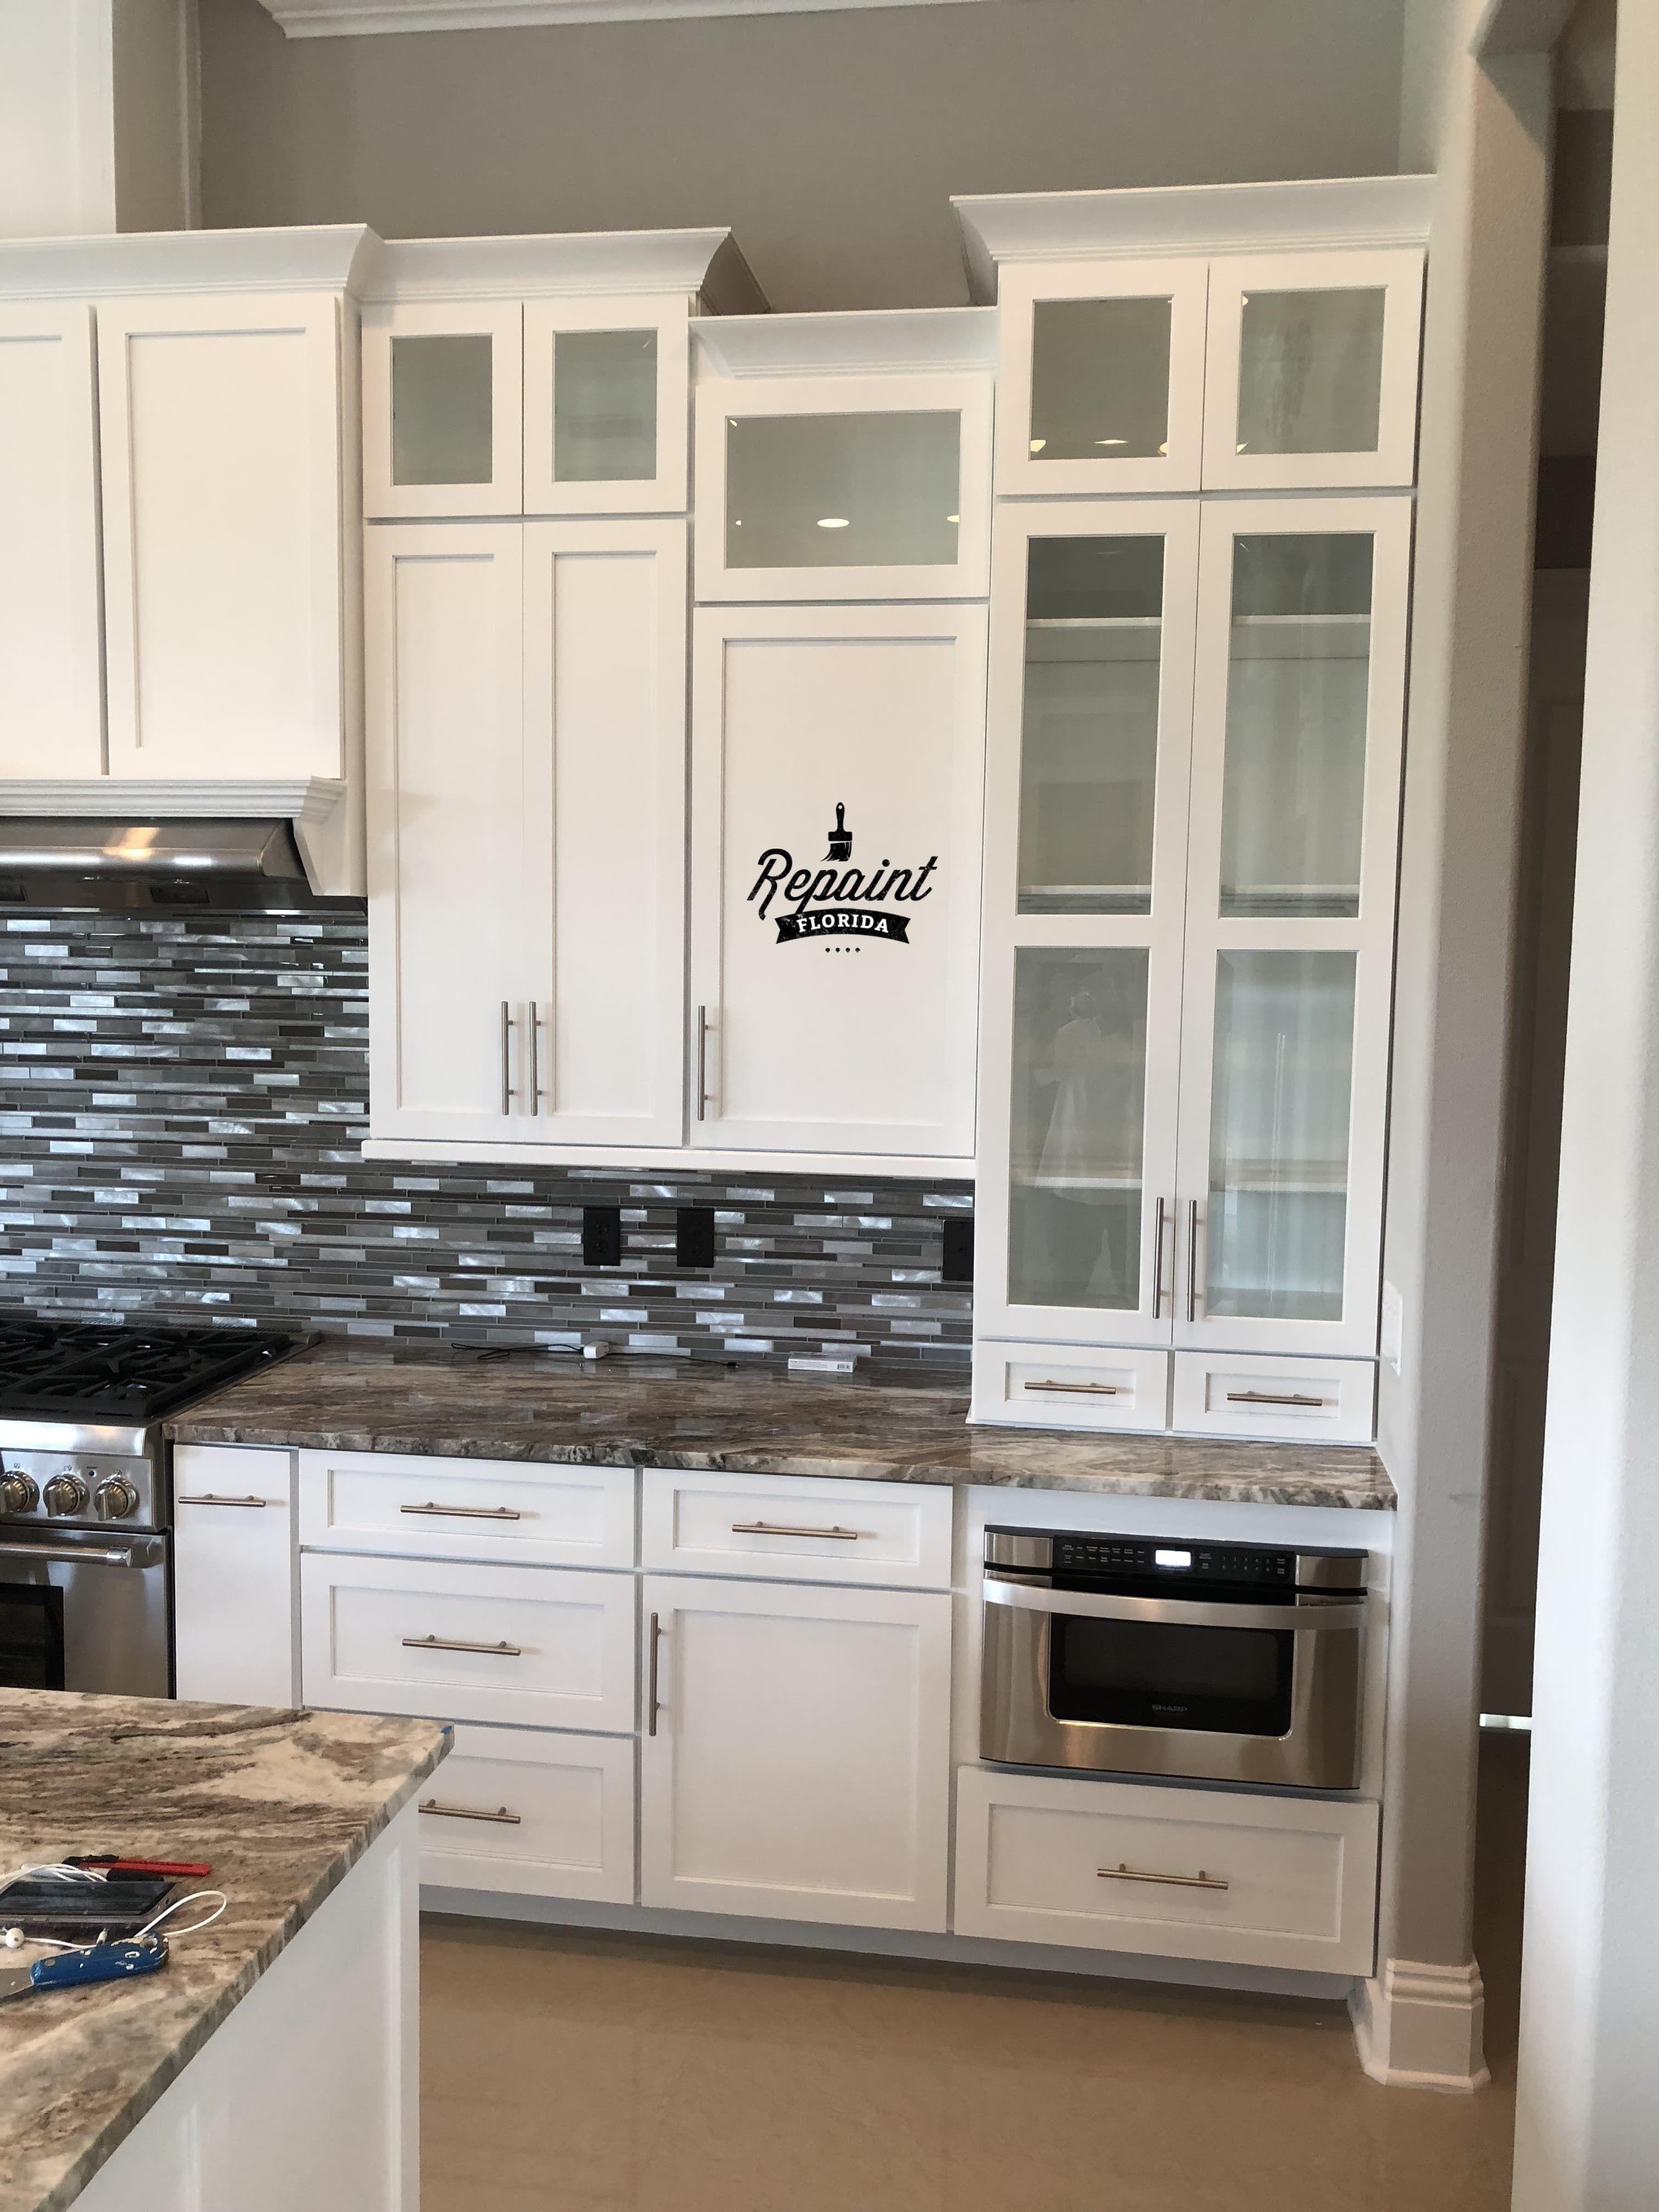 Kitchen Cabinet Refinishing Orlando Fl 2021 Refinishing Cabinets Kitchen Cabinets Cabinet Design